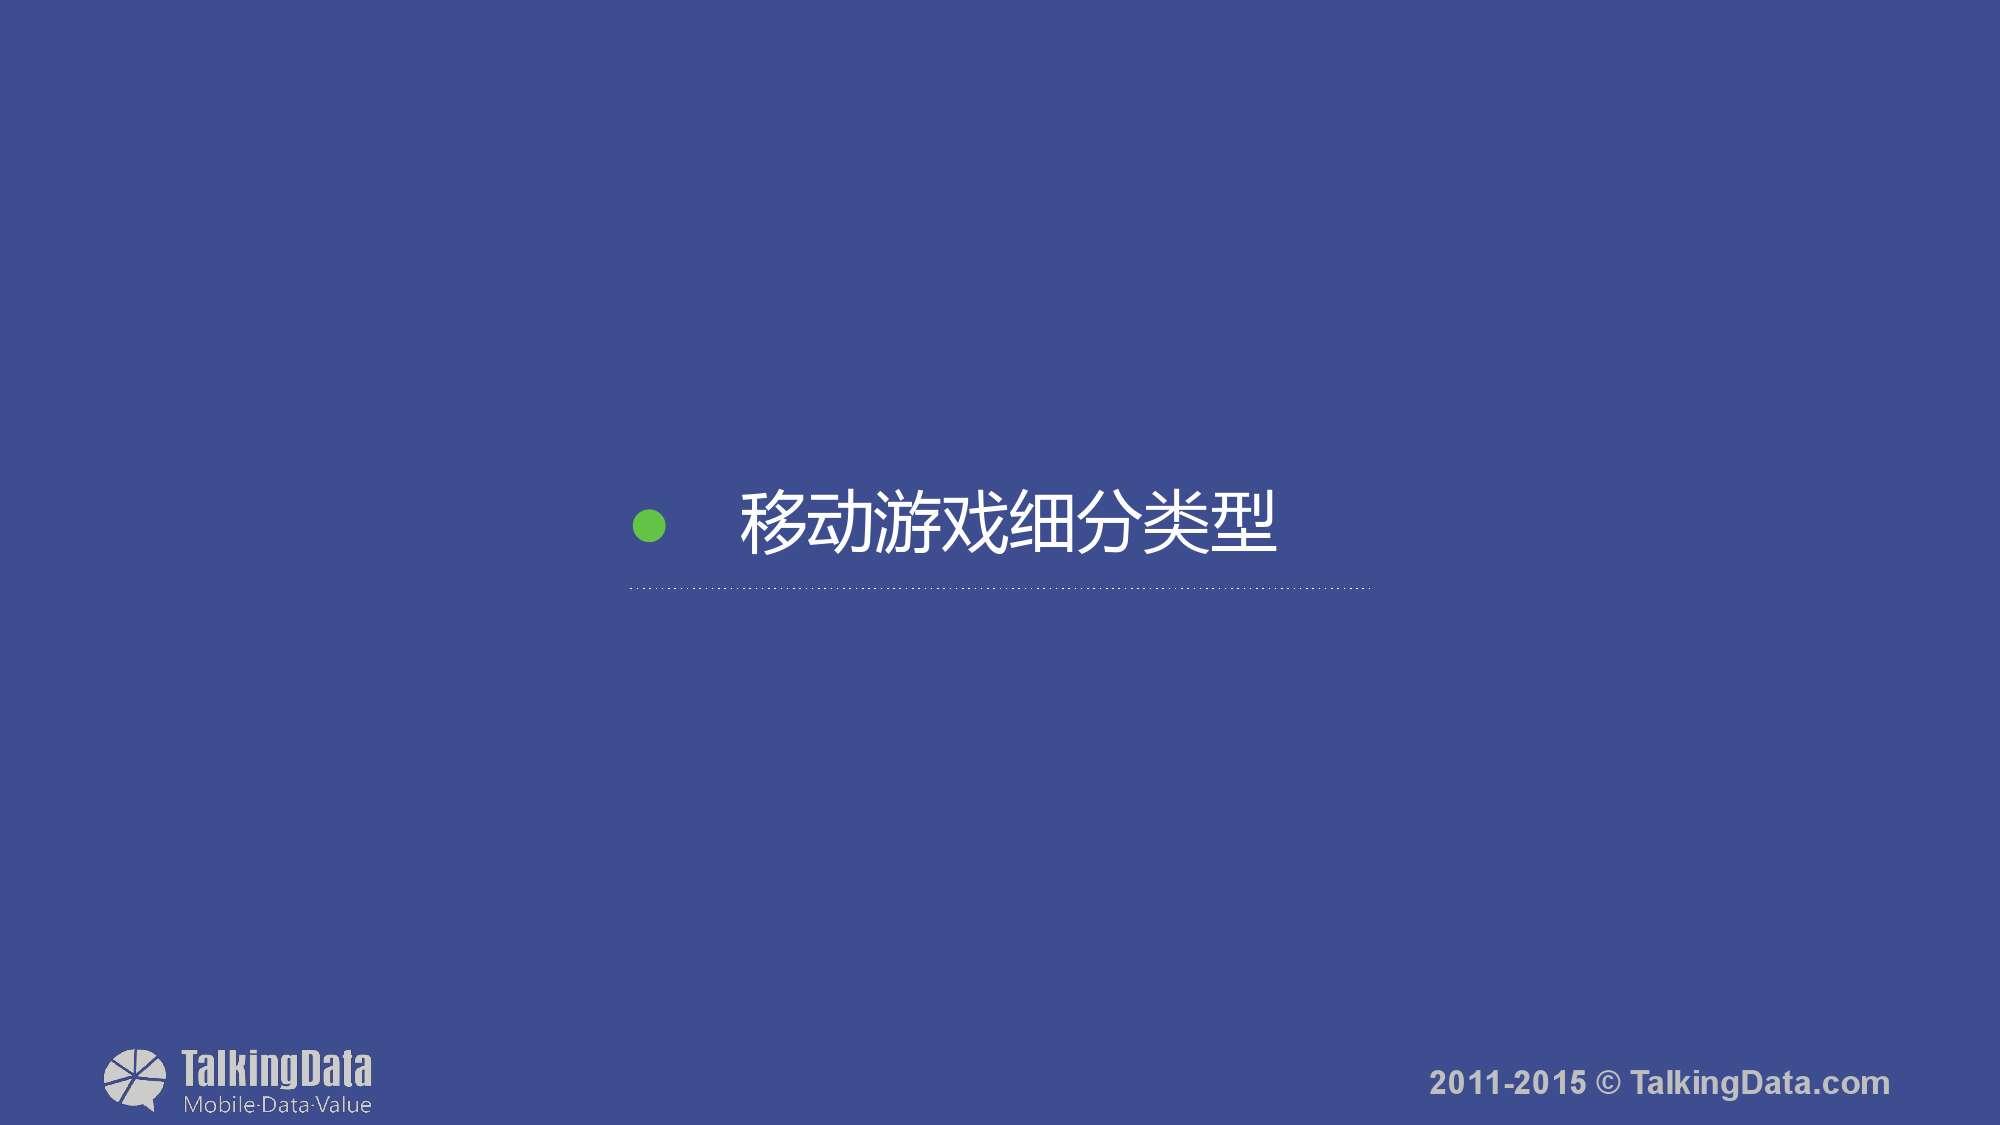 TalkingData-2015年移动游戏行业报告_000034